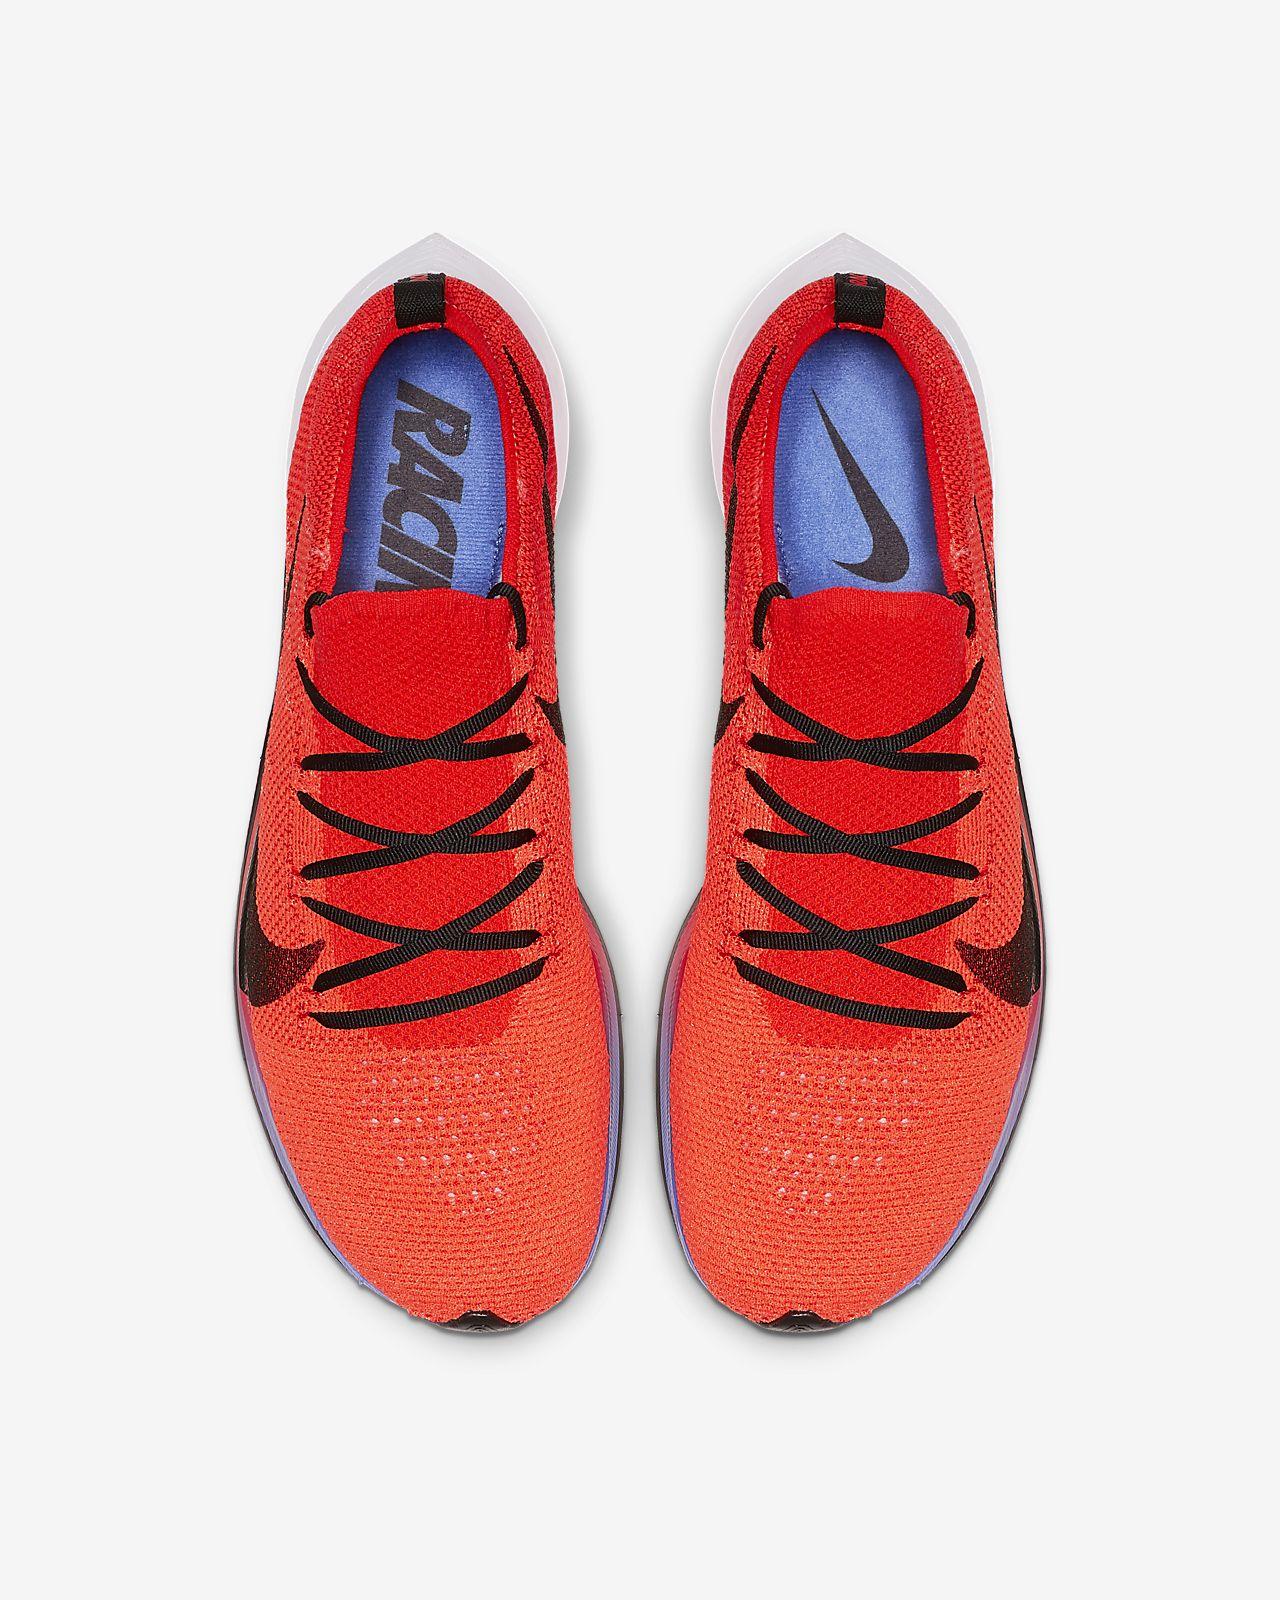 Nike Vaporfly 4% Flyknit Laufschuh